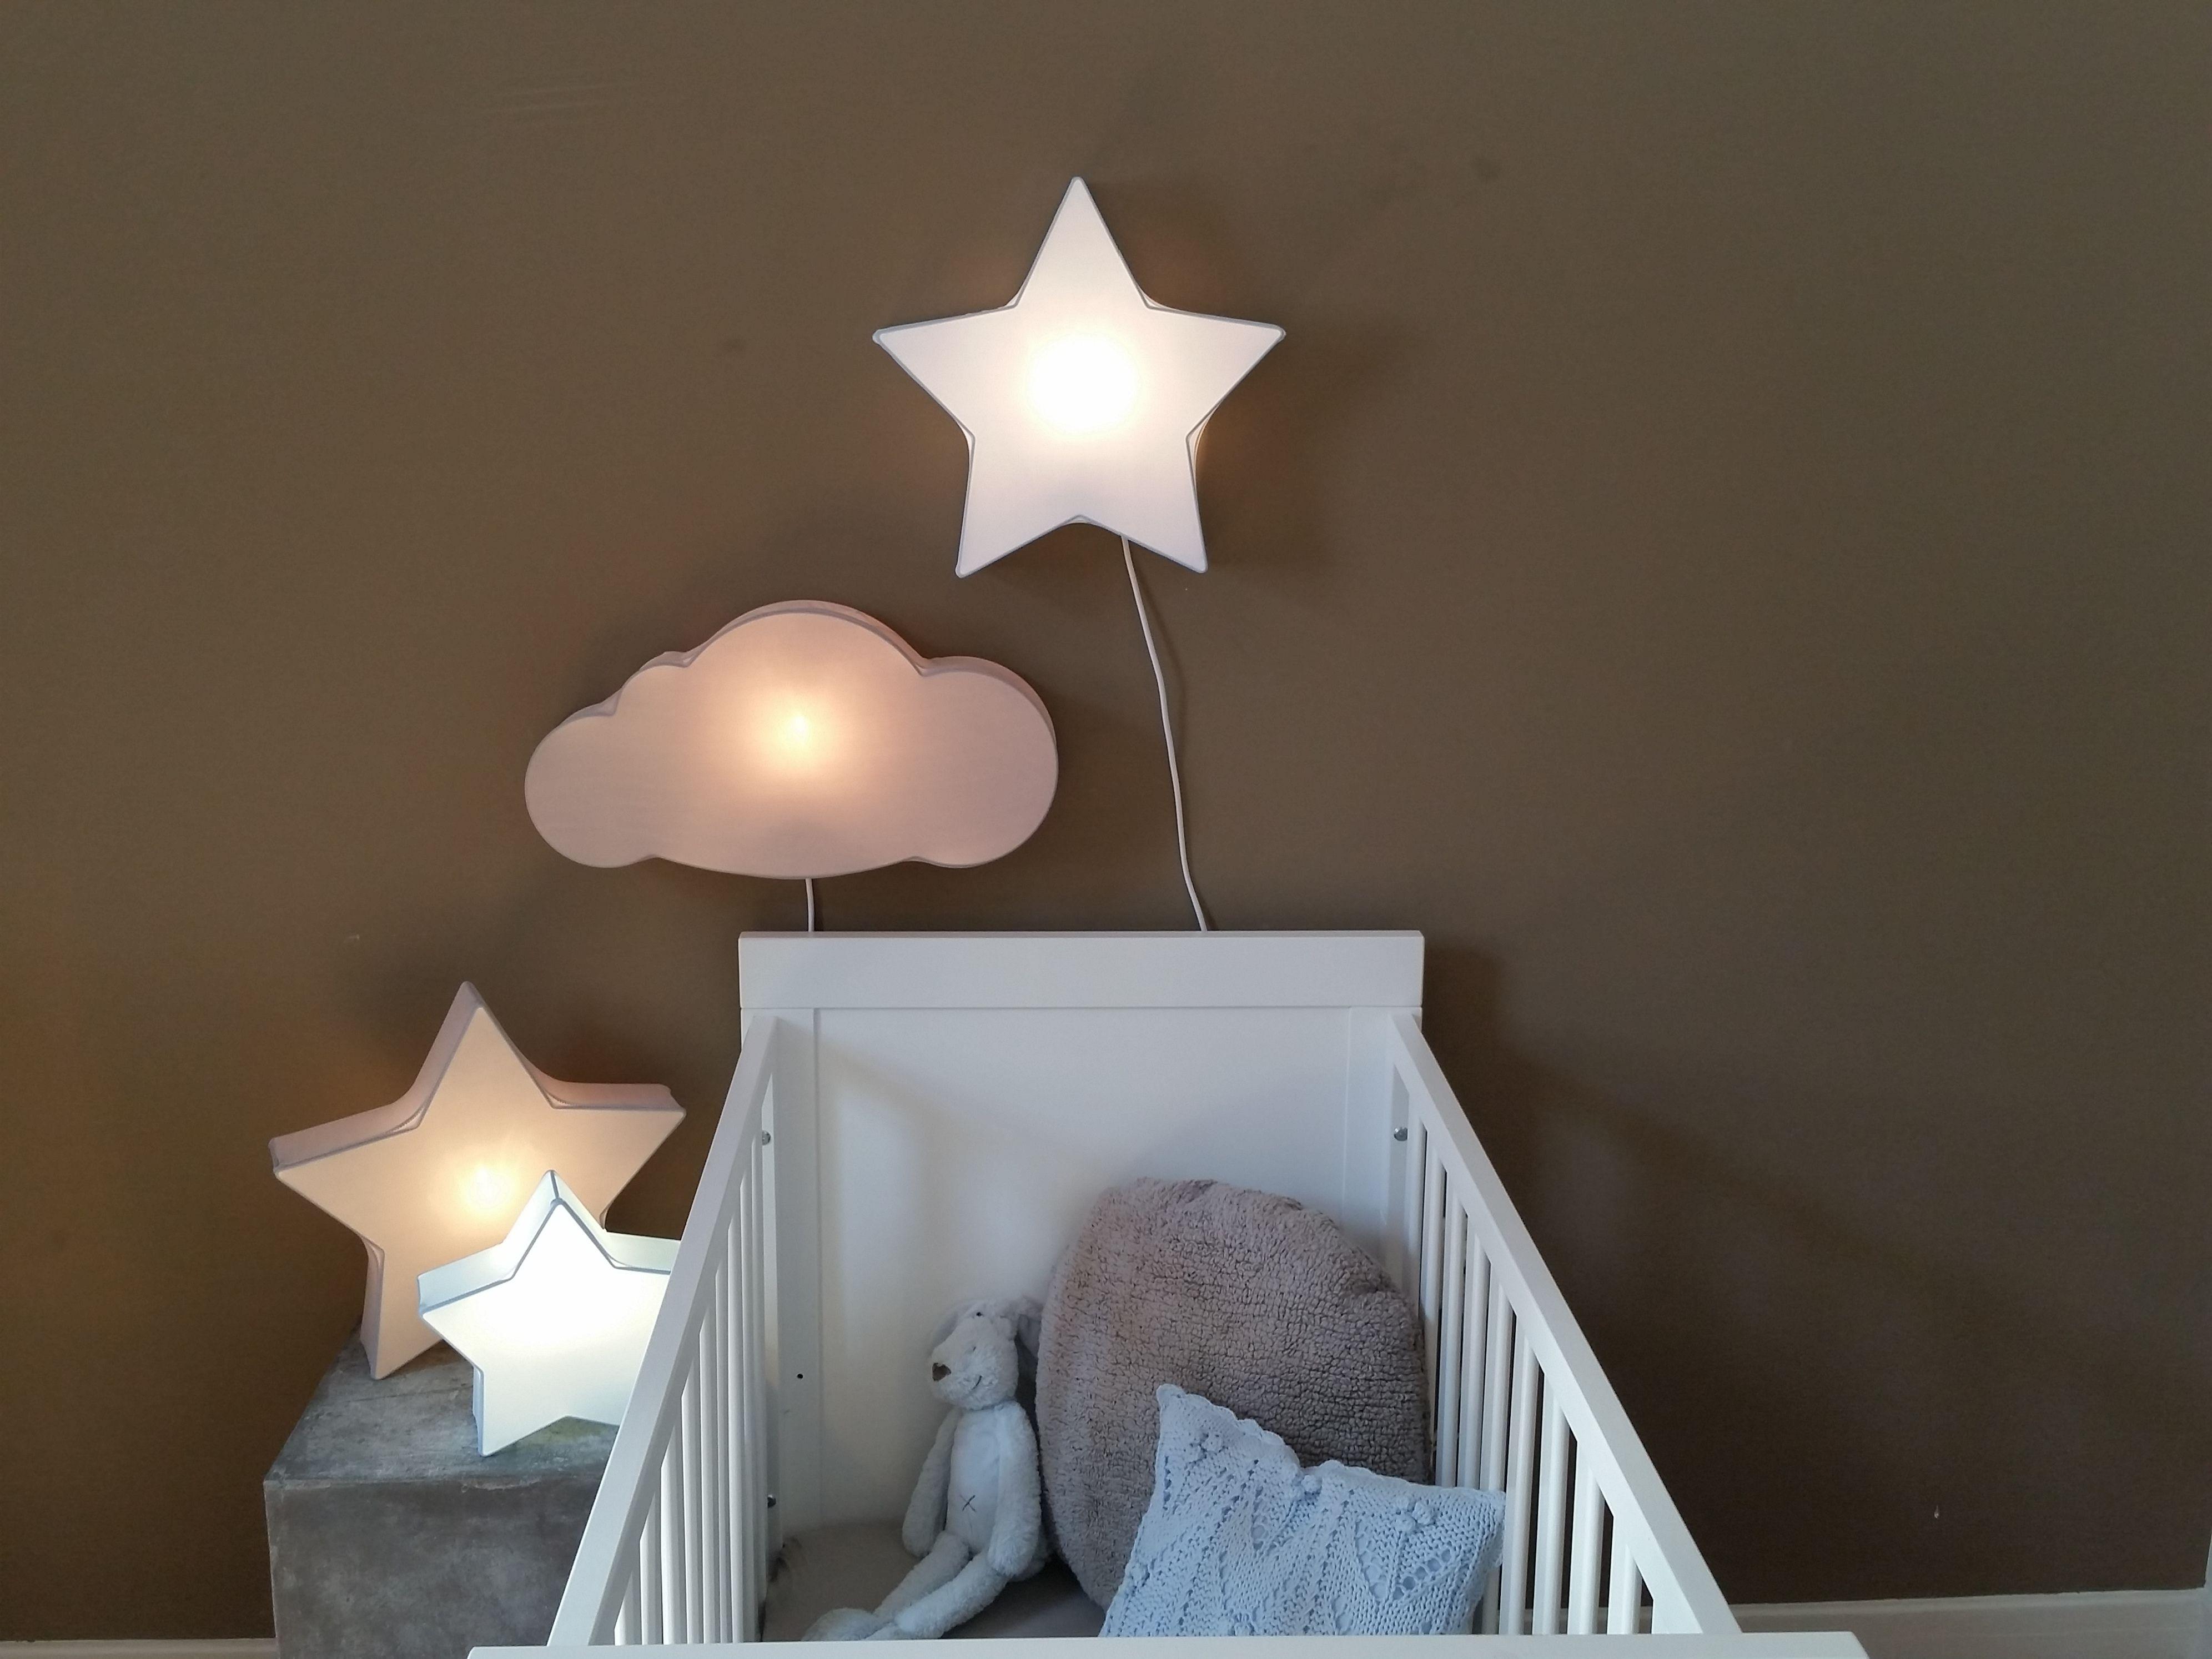 Lamp Kinderkamer Design : Www.noonos.com #lamp babykamer #light #lampe #decoratie